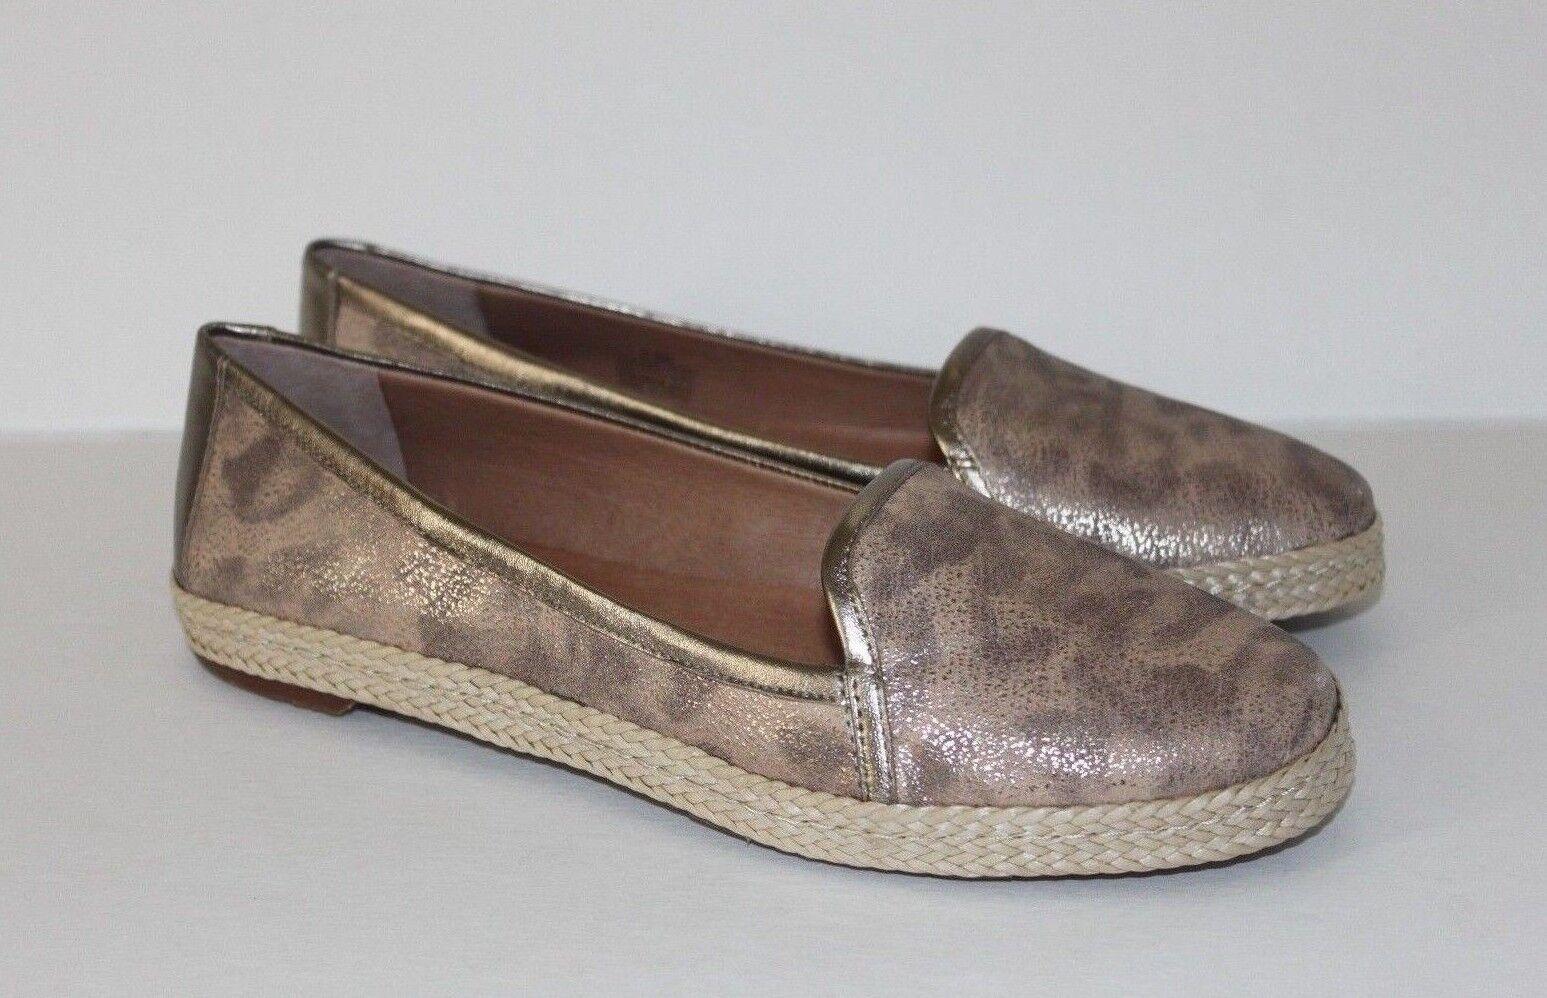 Nurture Women's Rylee gold Timbukto Leather Espadrille Espadrille Espadrille Loafer shoes 6.5   8 M 96f64e